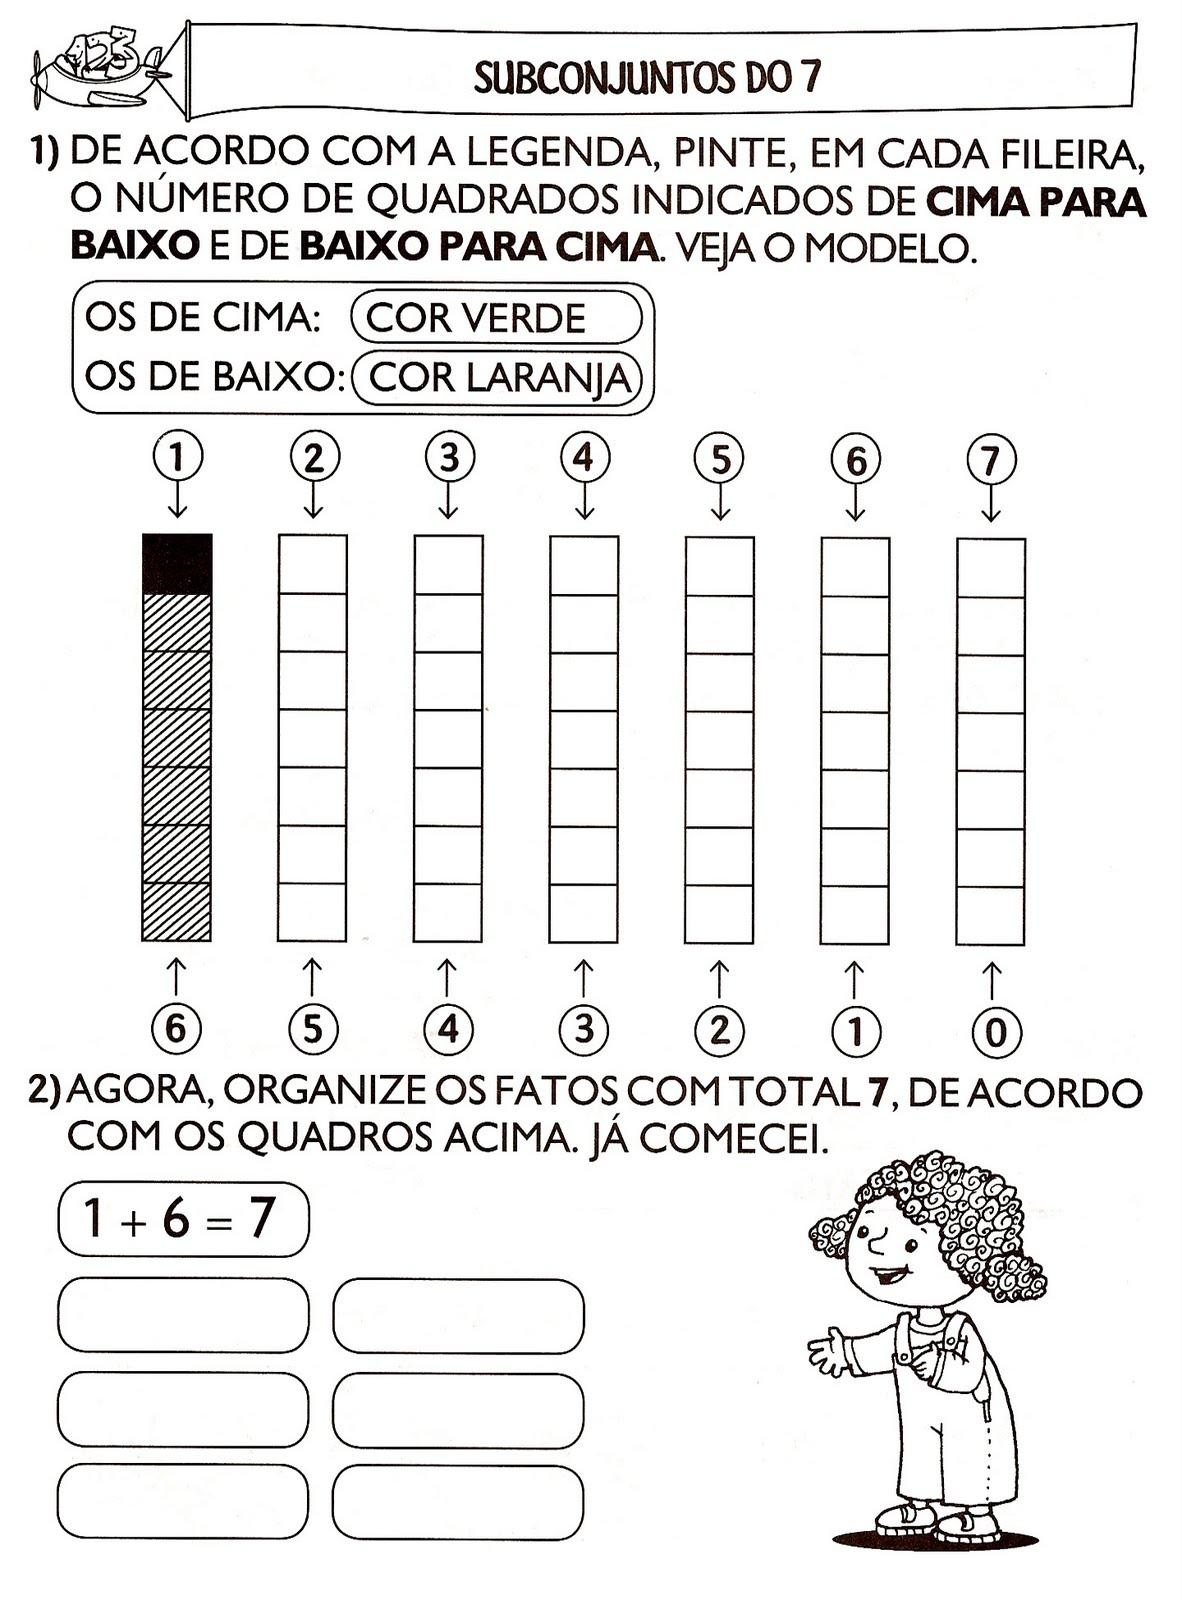 Historia de brasilia yahoo dating 2